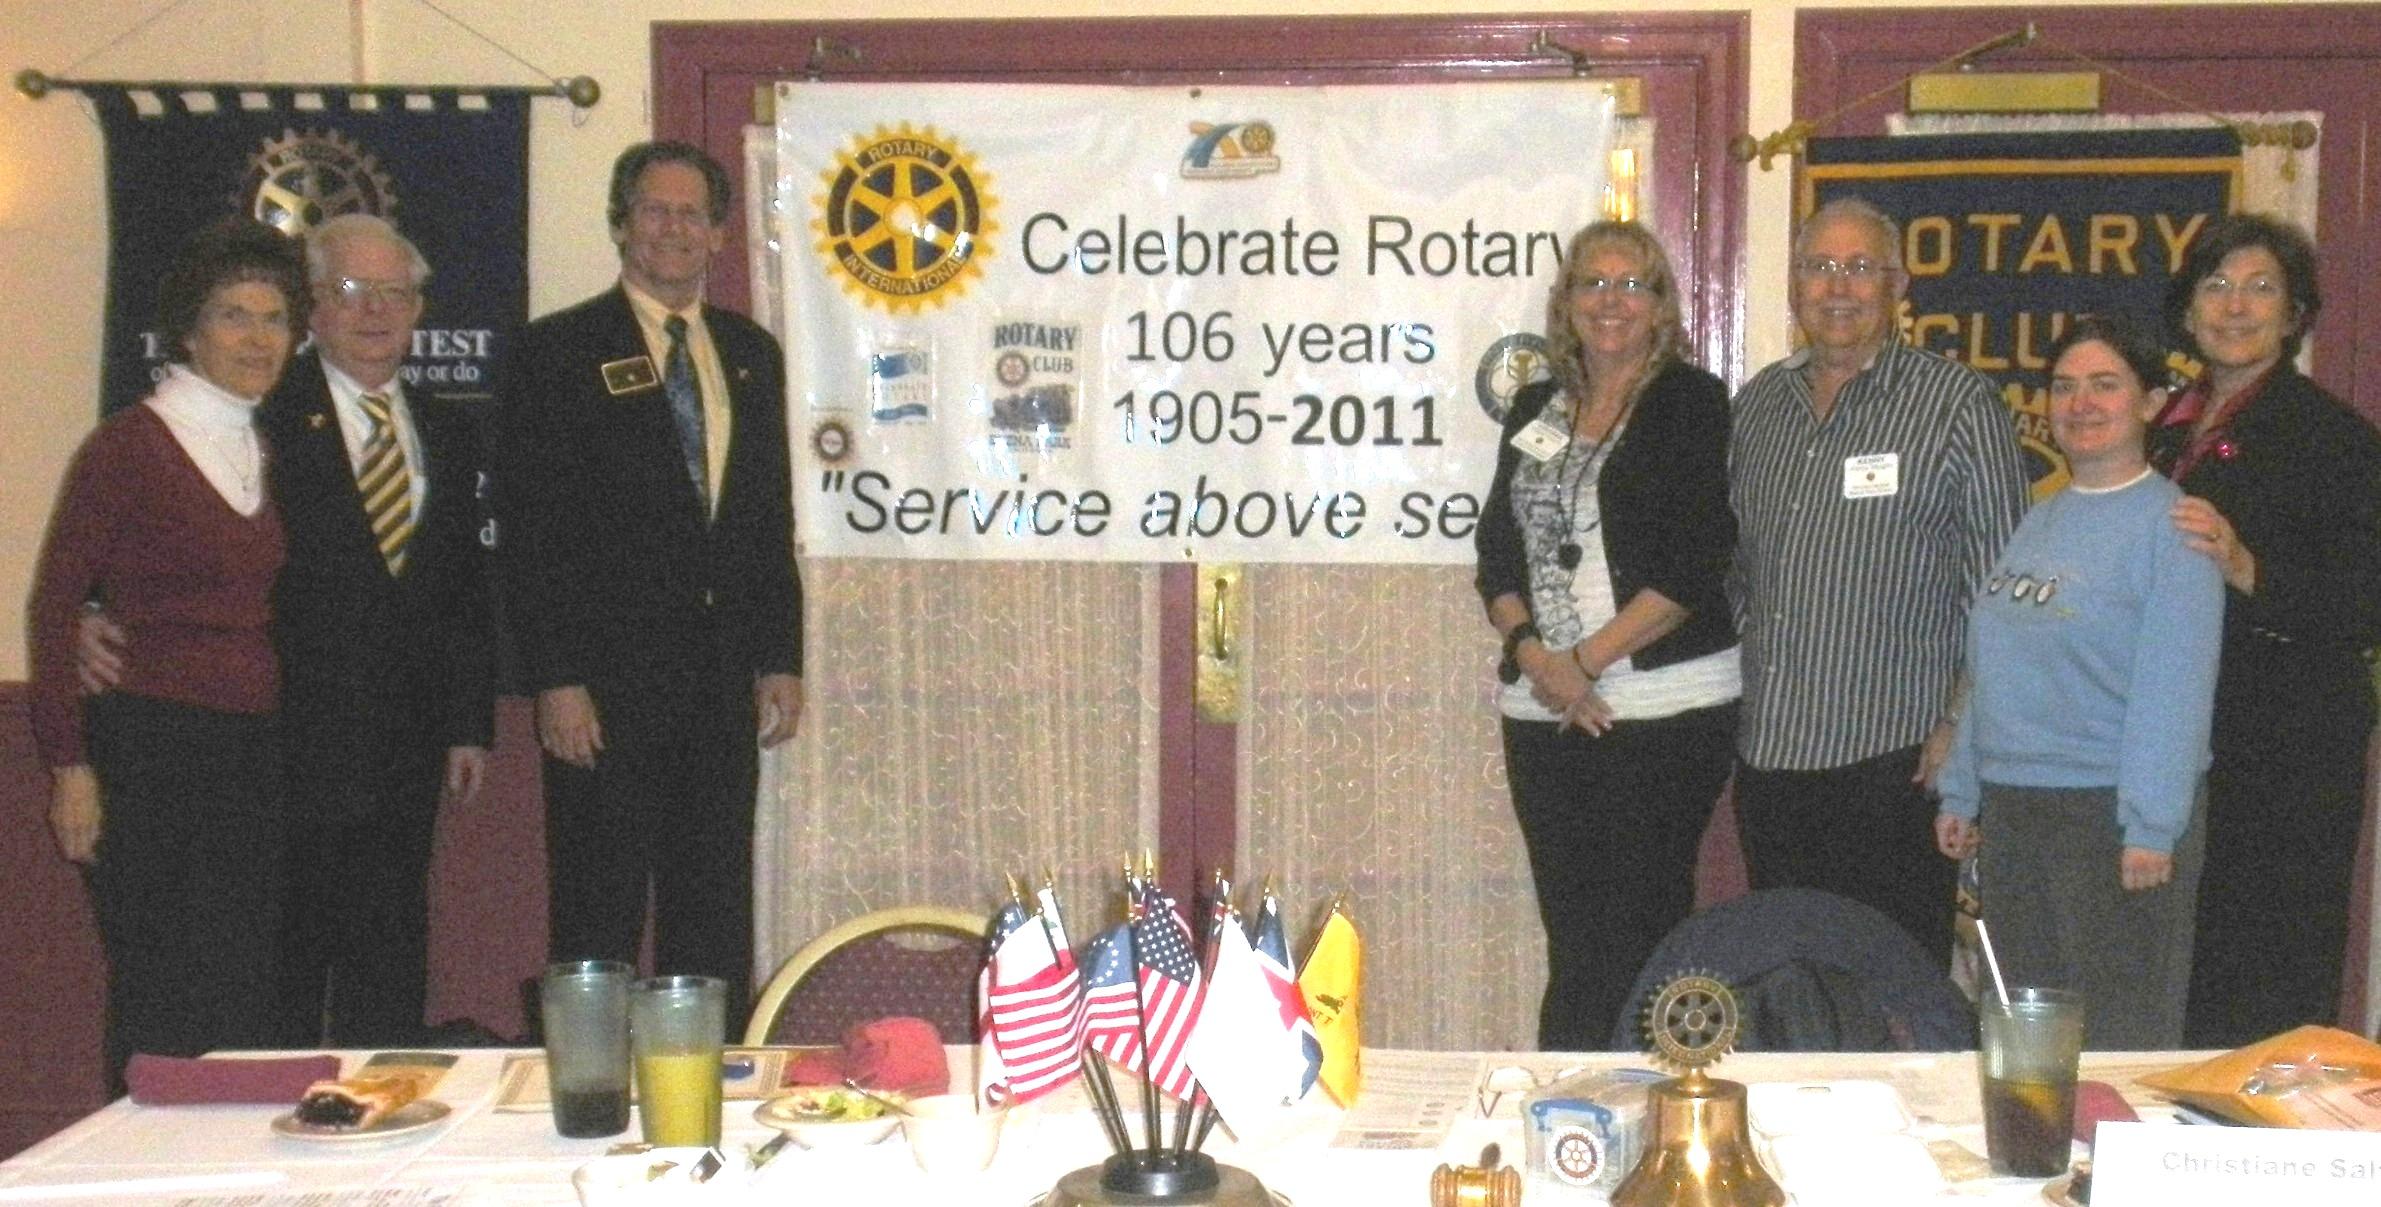 wk35 Rotary RI 106th Birthday .JPG